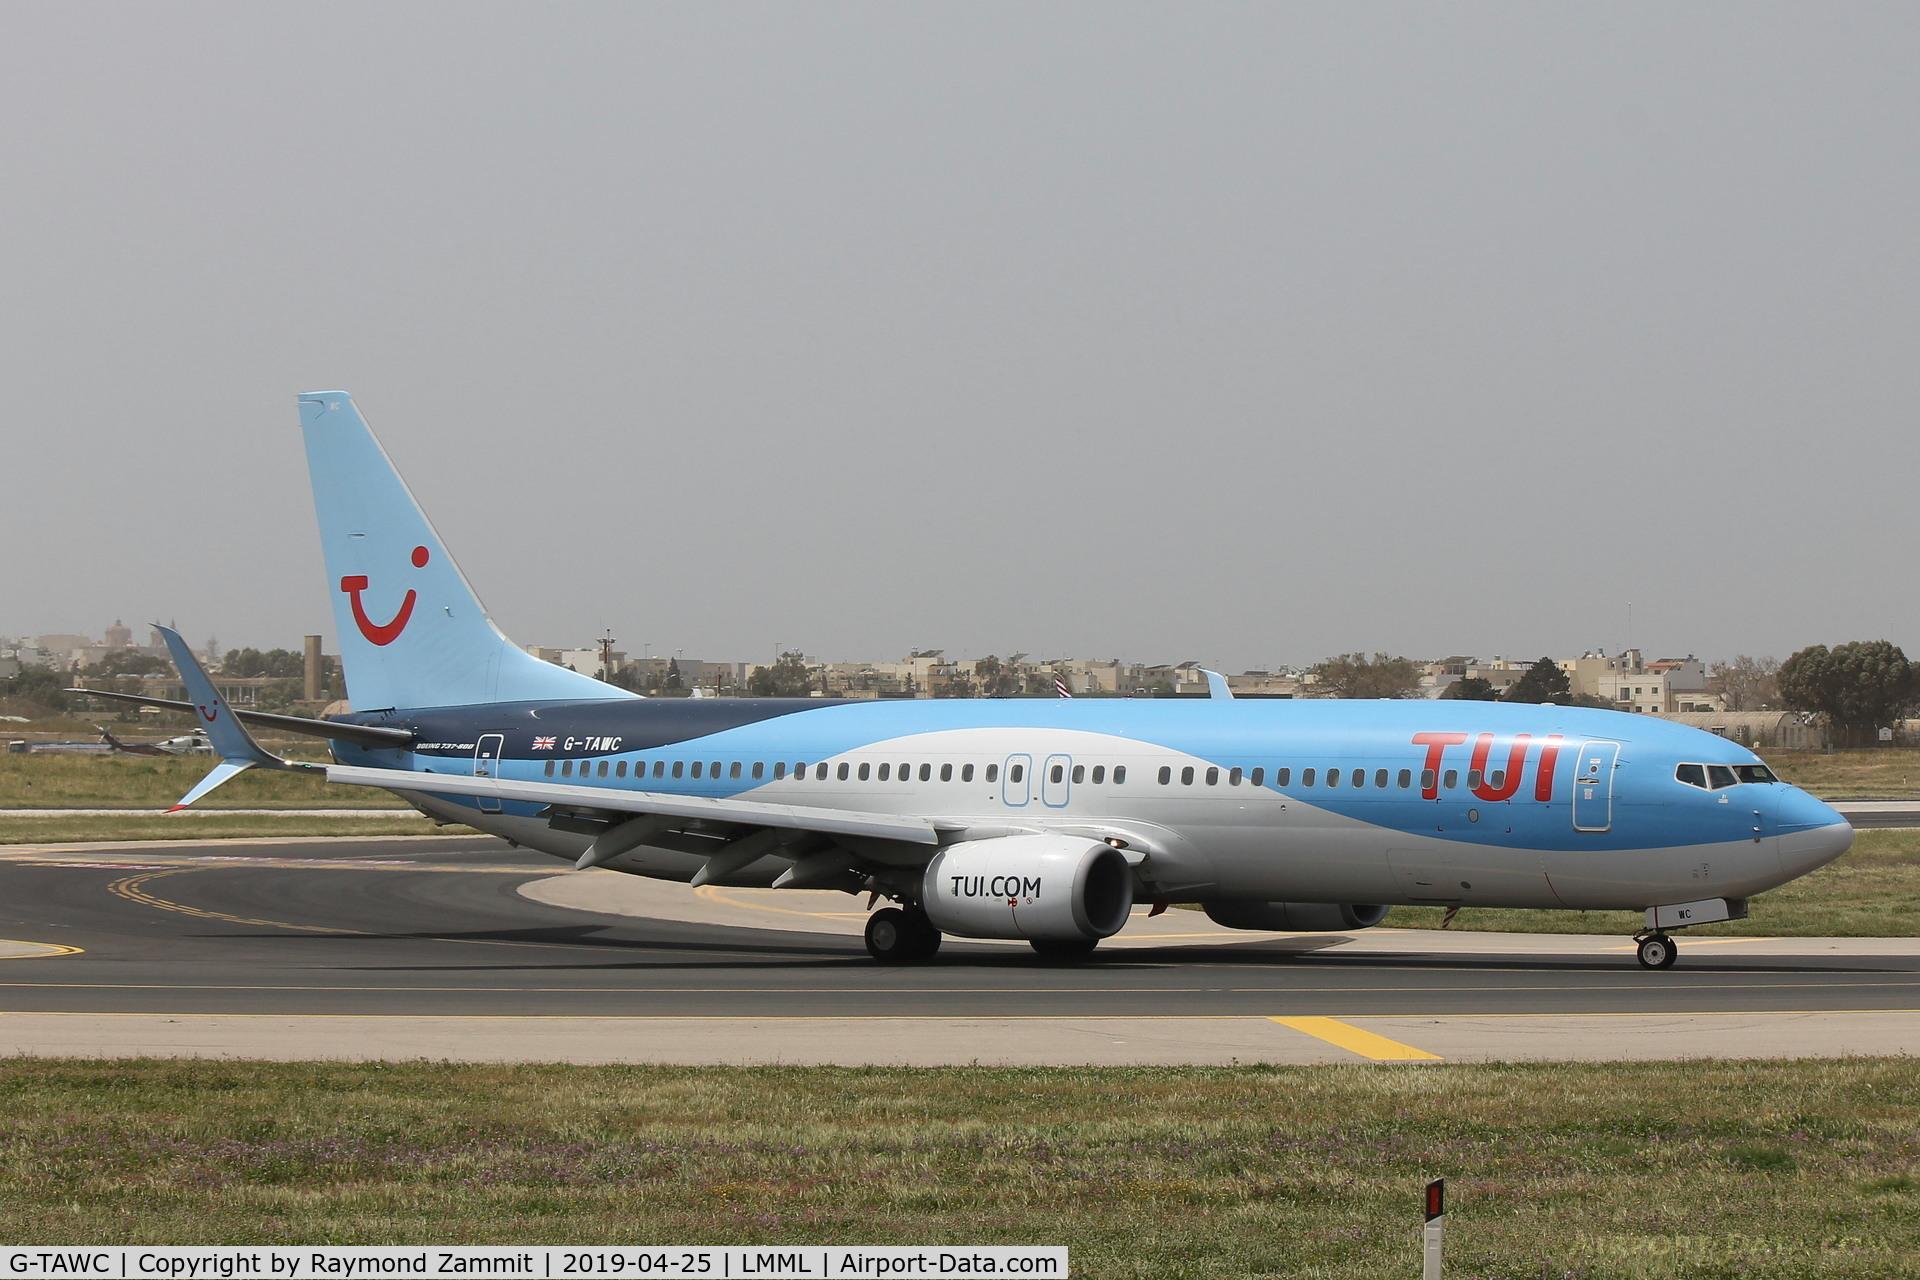 G-TAWC, 2012 Boeing 737-8K5 C/N 39922, B737-800 G-TAWC Thomson Airways